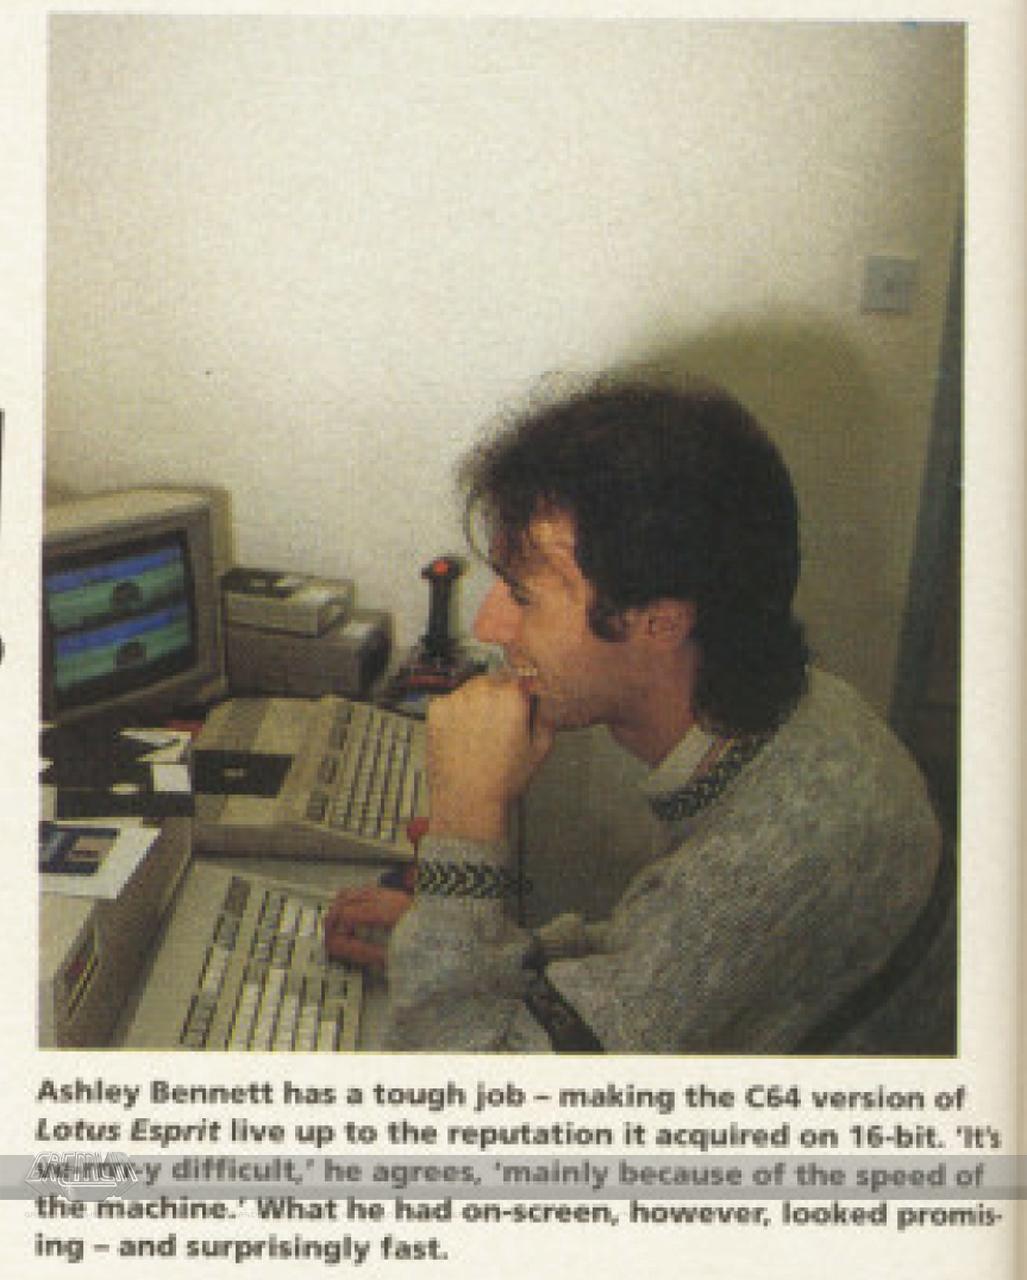 Ash Bennett coding Lotus Esprit Turbo Challenge (C64)